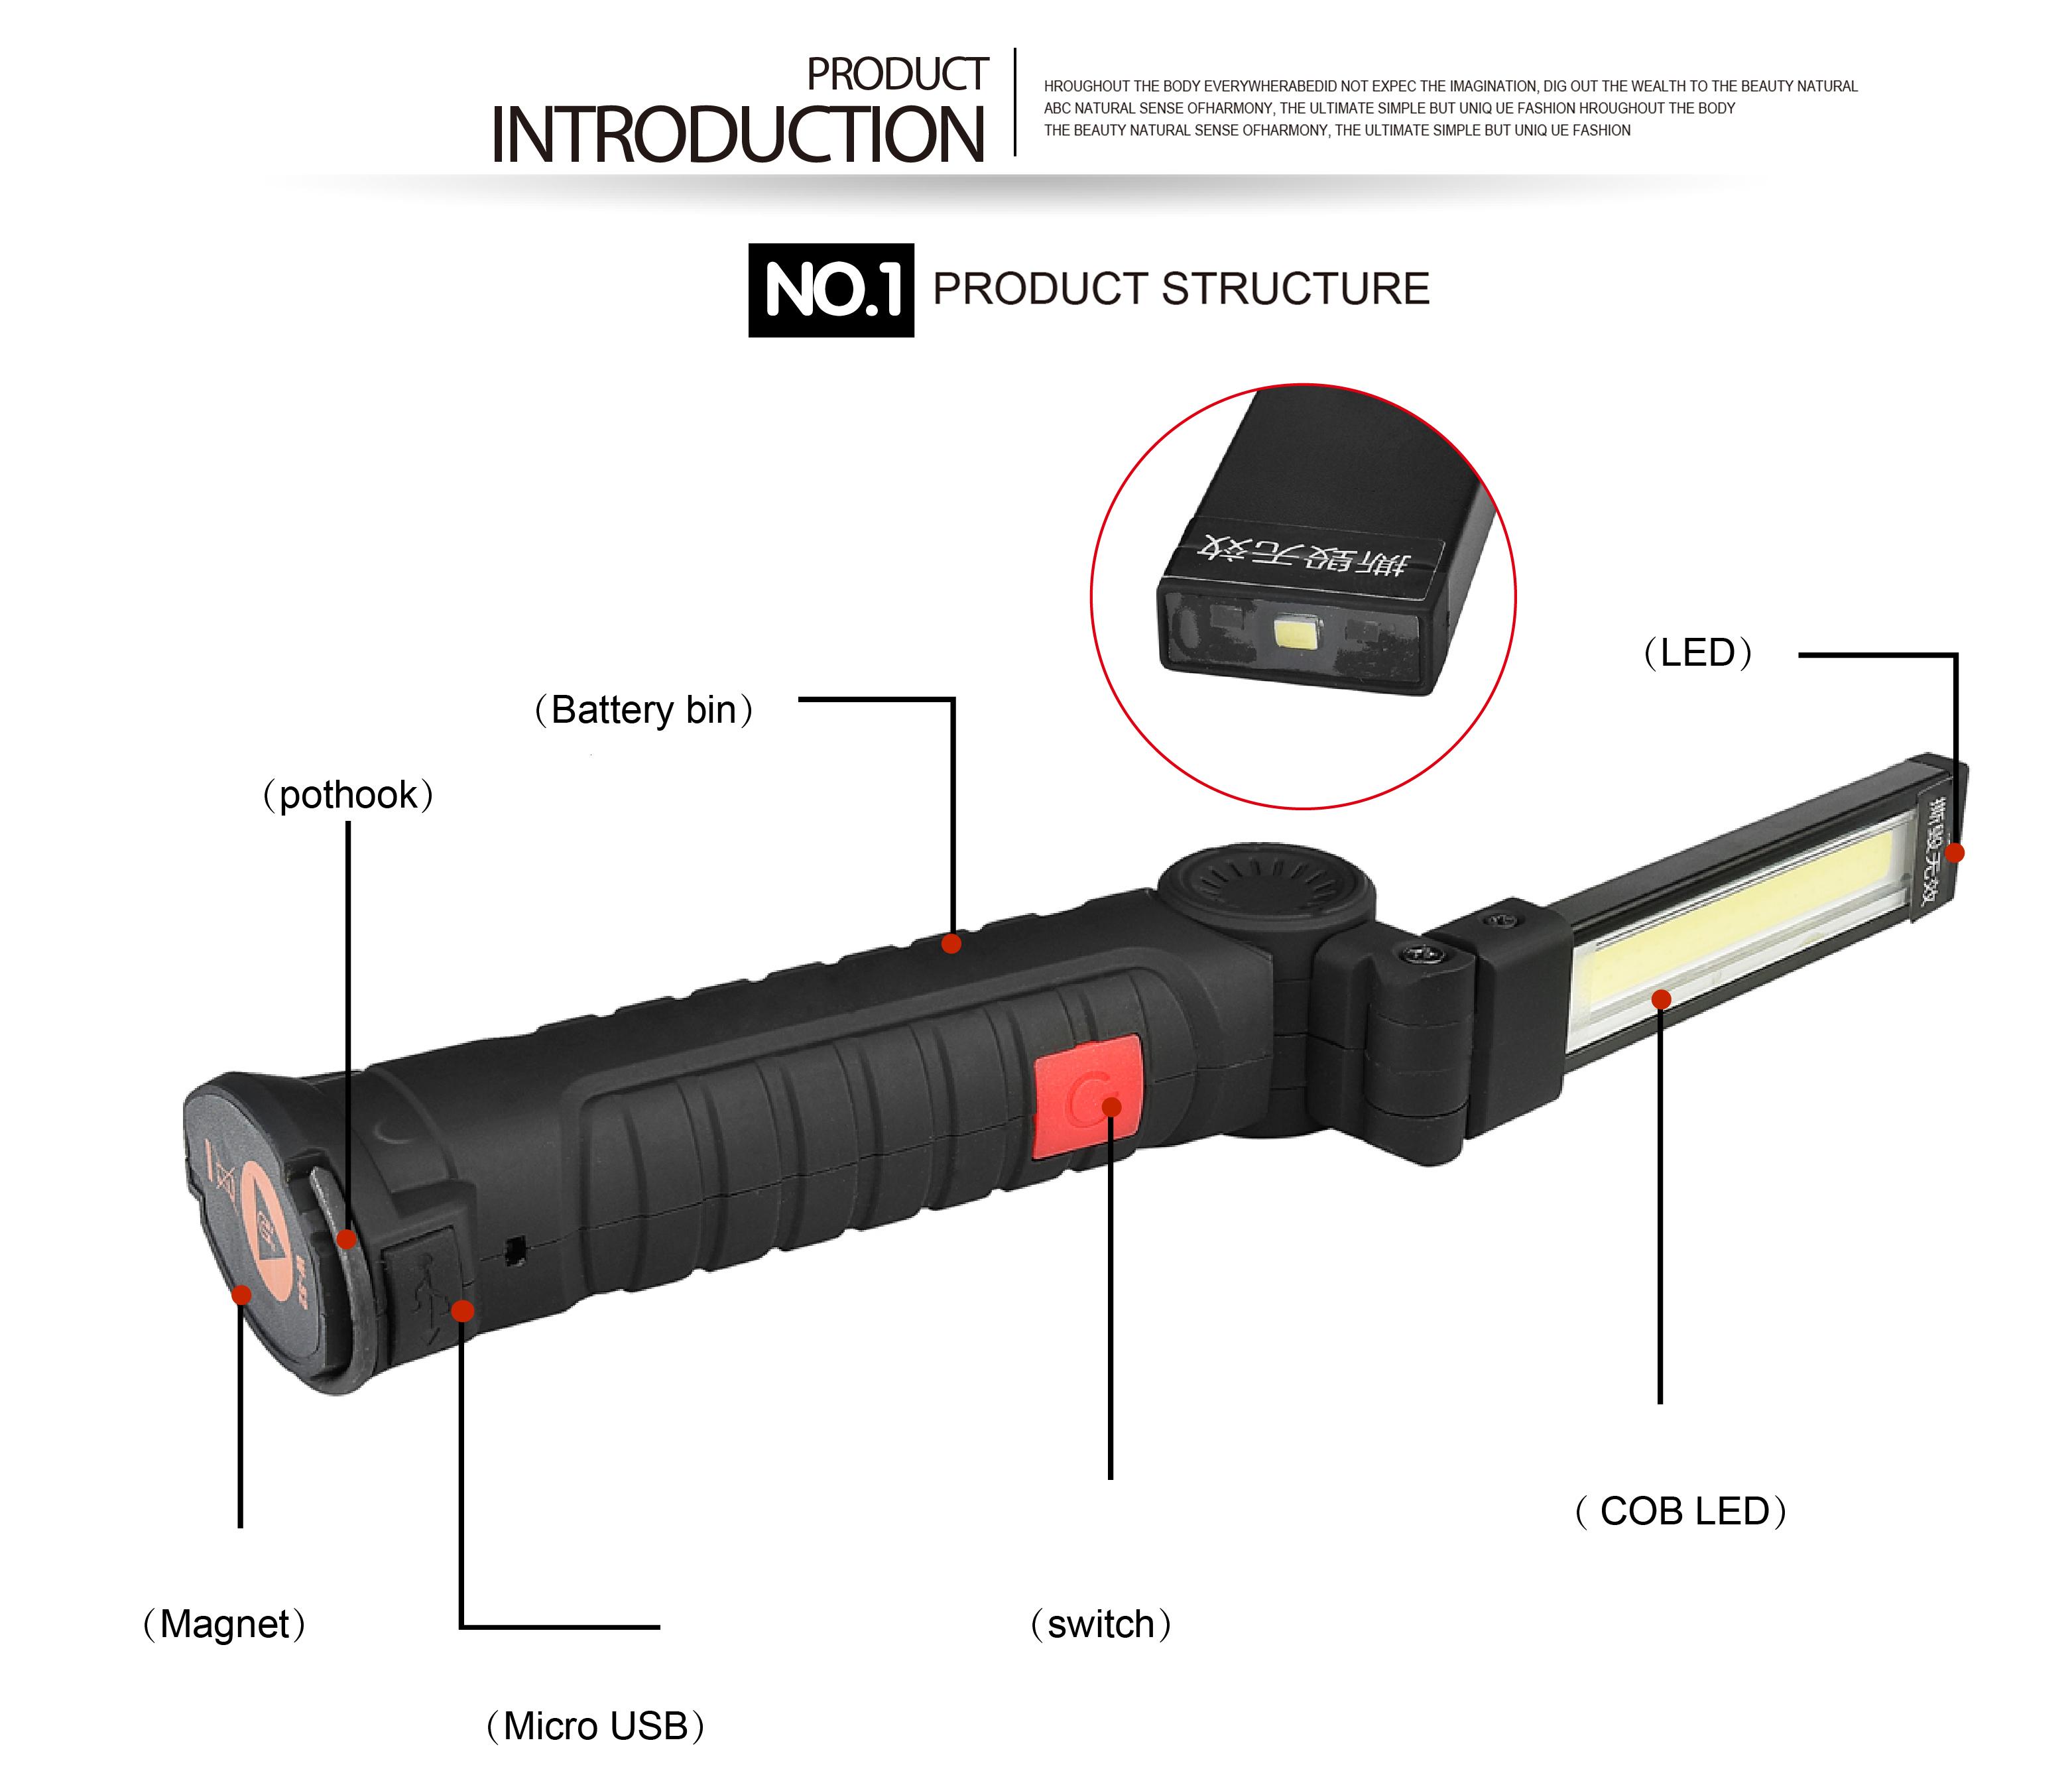 Portable Bright COB LED Lights USB Charging Magnet Lamp Red Light Emergency Flashlight 175-A